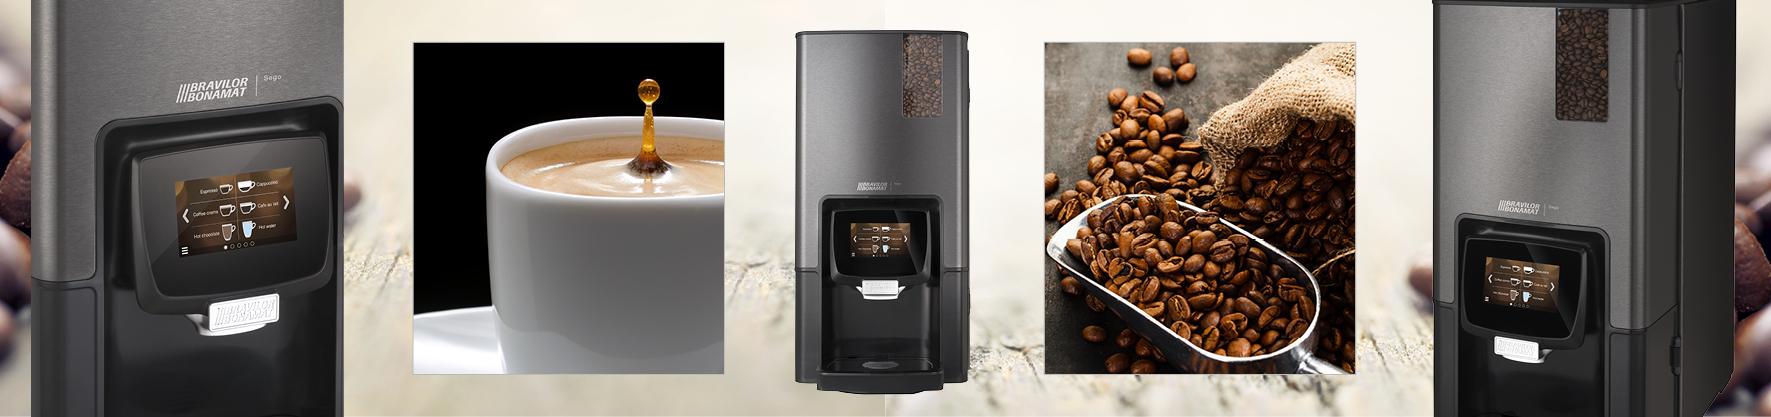 Bravilor Bonamat launches the Sego compact espresso machine